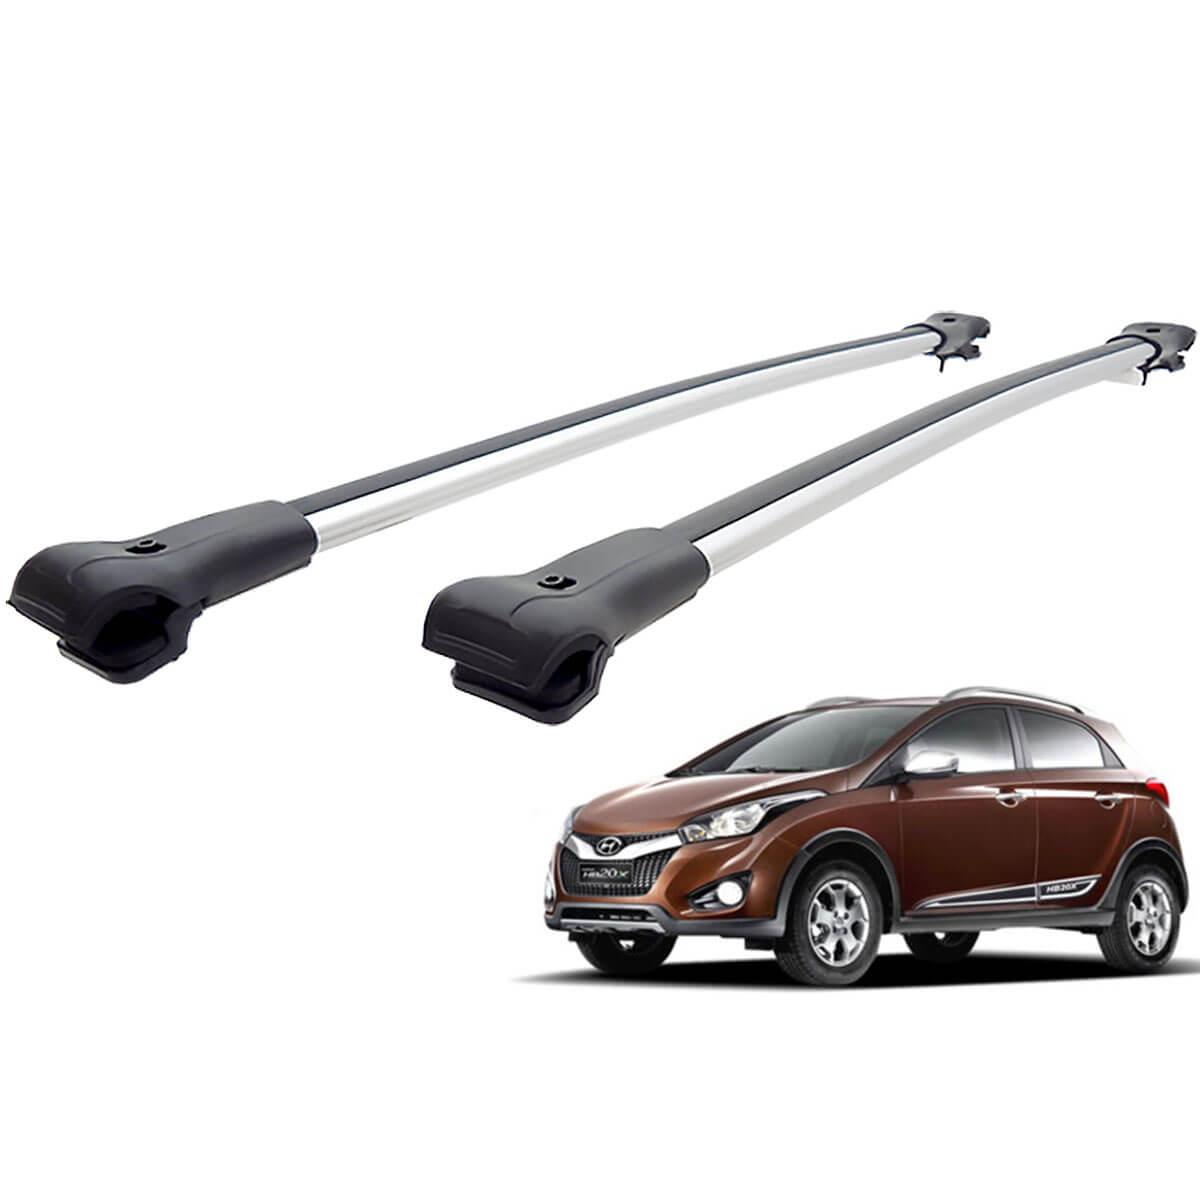 Travessa rack de teto larga alumínio HB20X 2014 a 2019